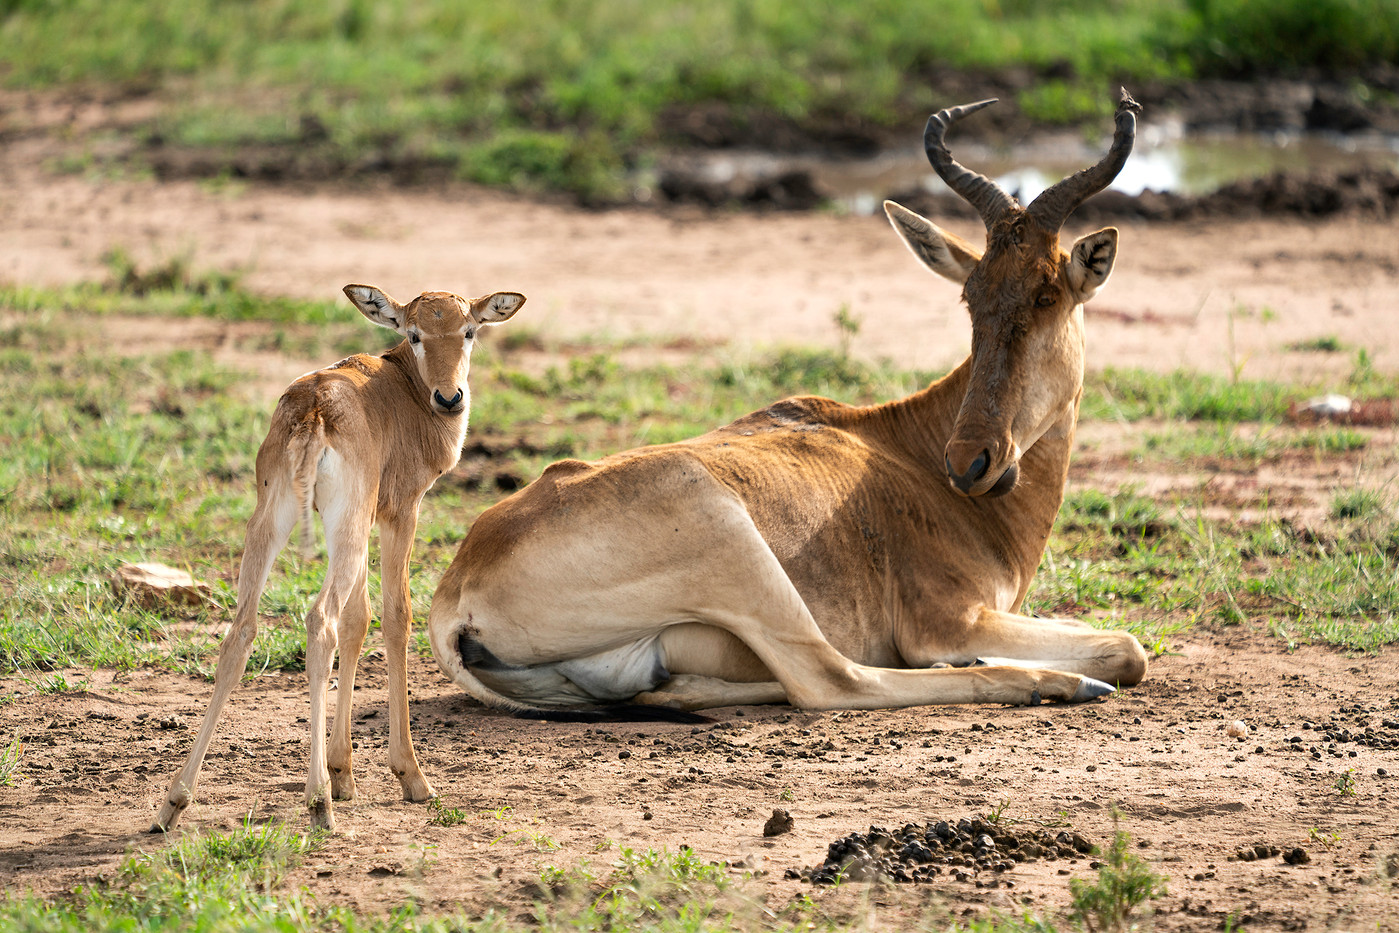 Coke's Hartebeest & calf in the Serengeti NP, Tanzania